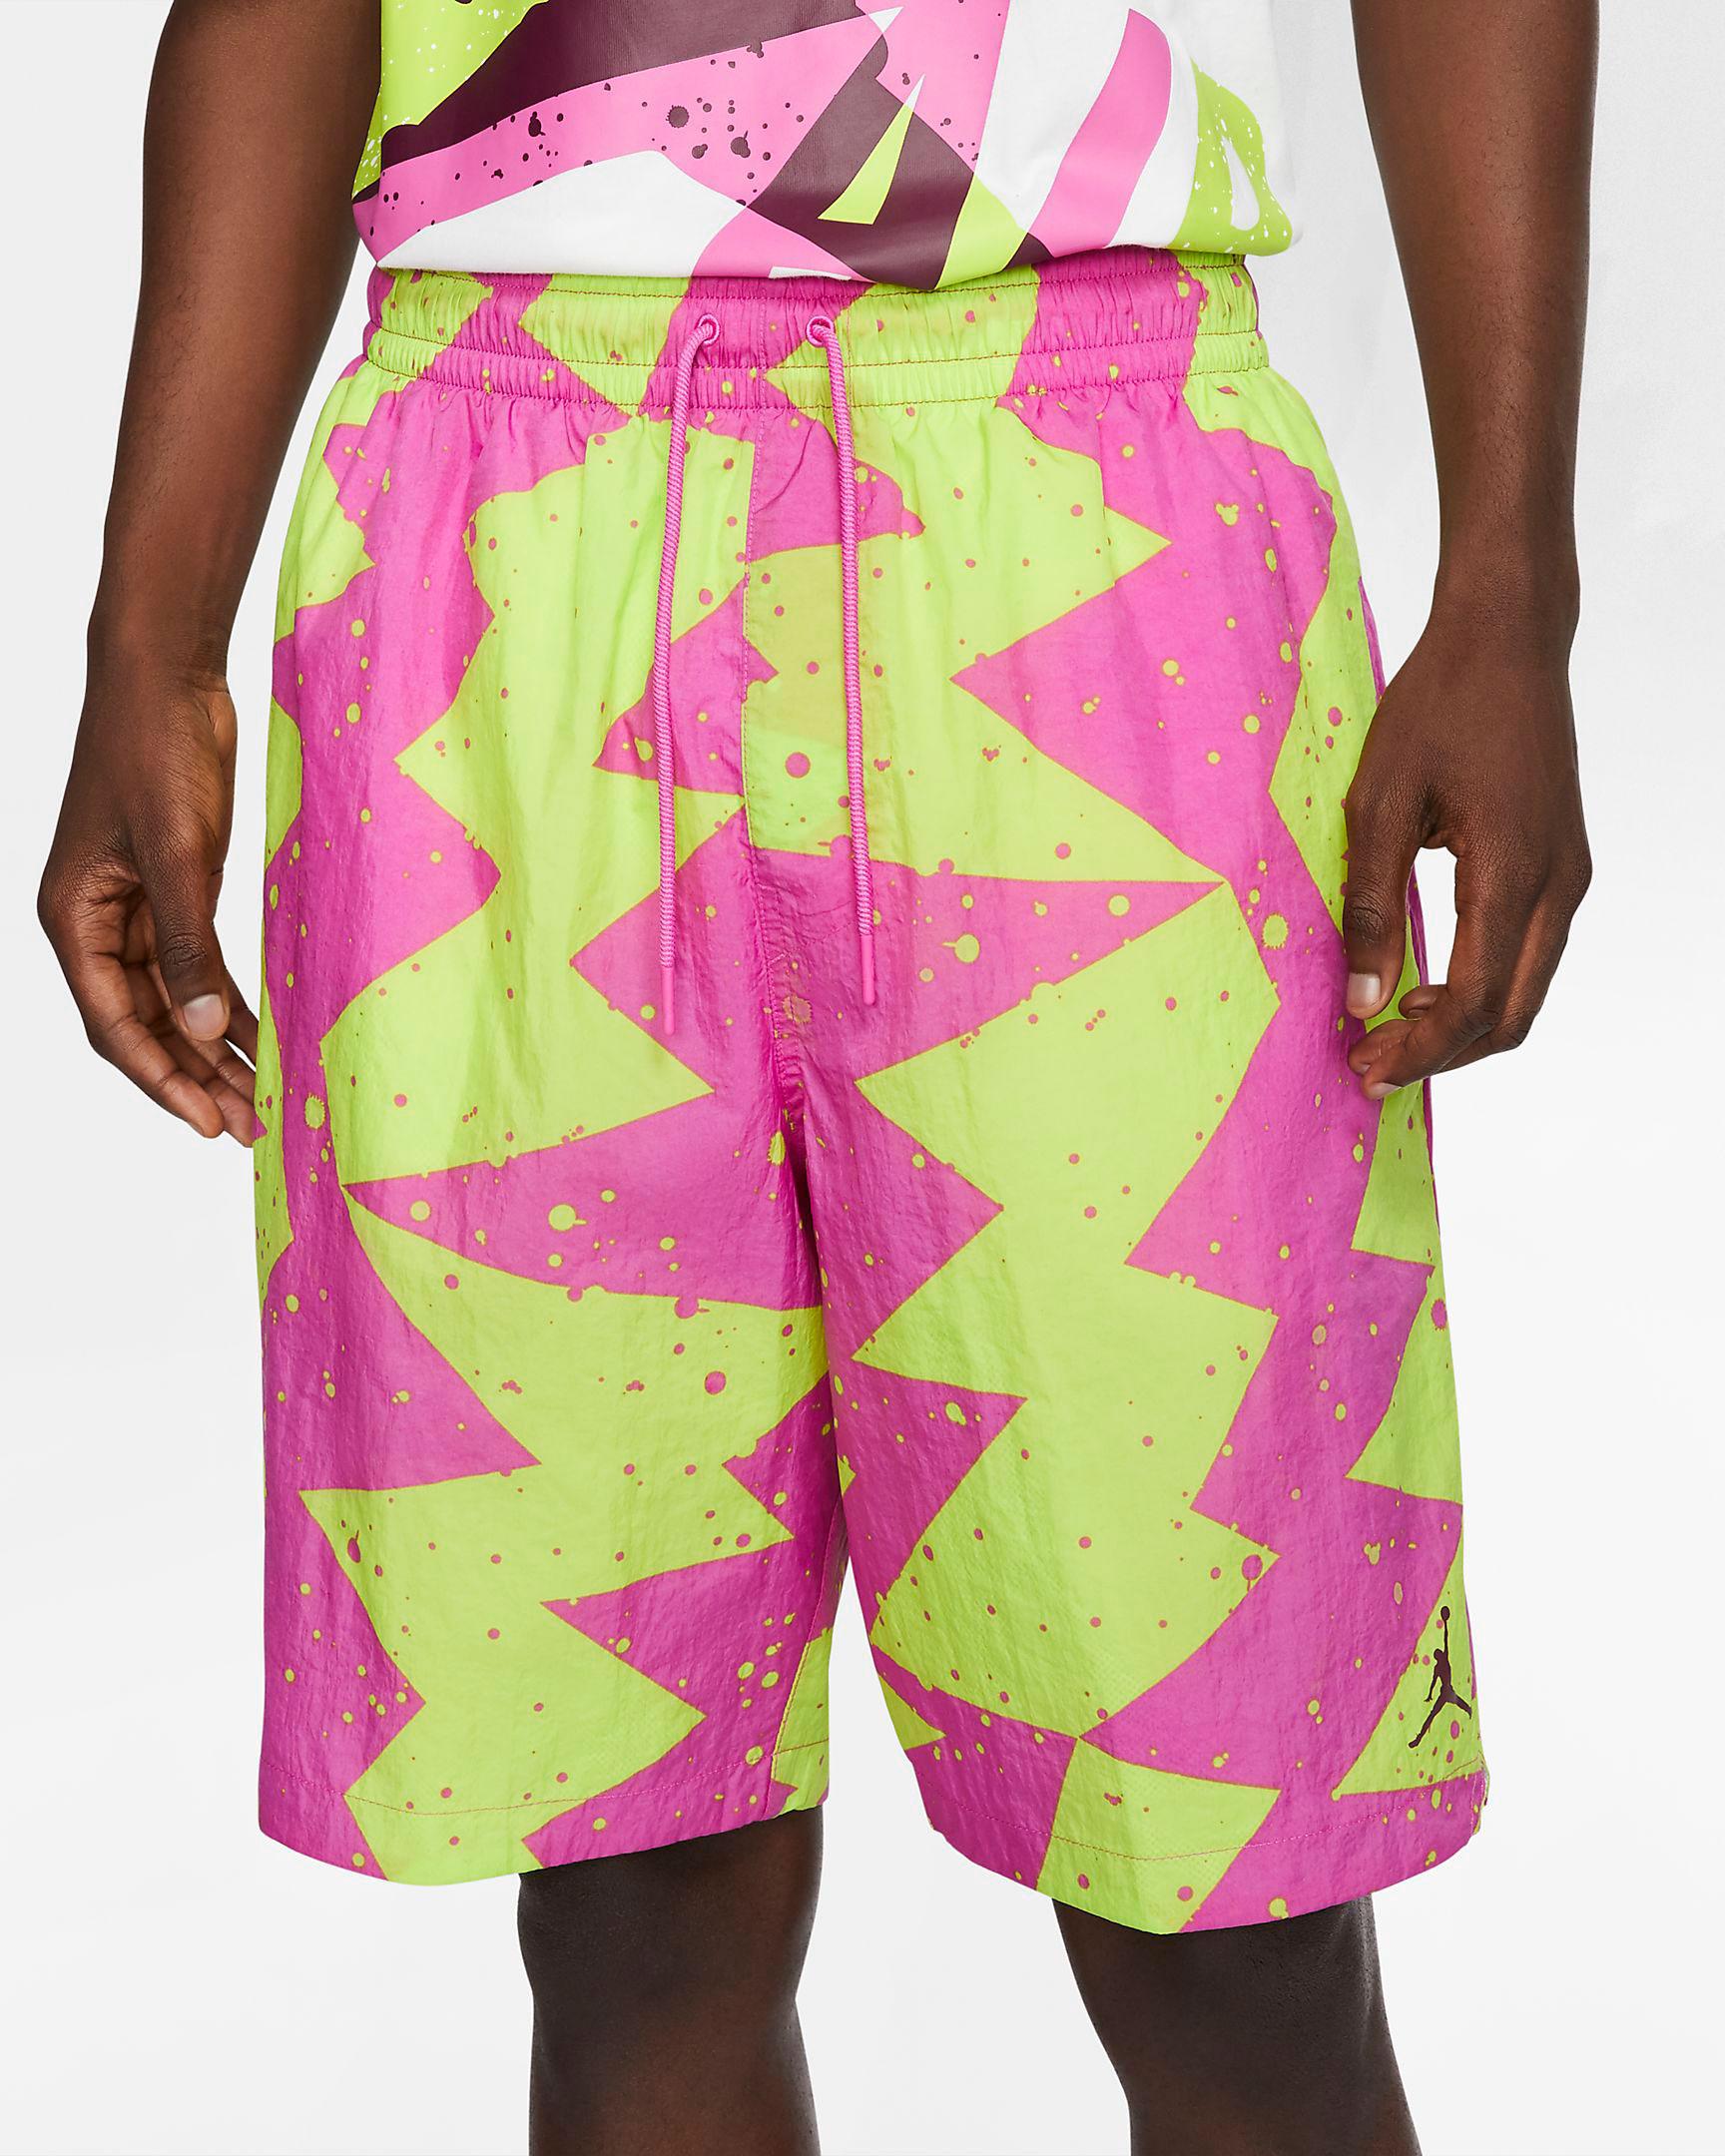 jordan-5-bel-air-alternate-shorts